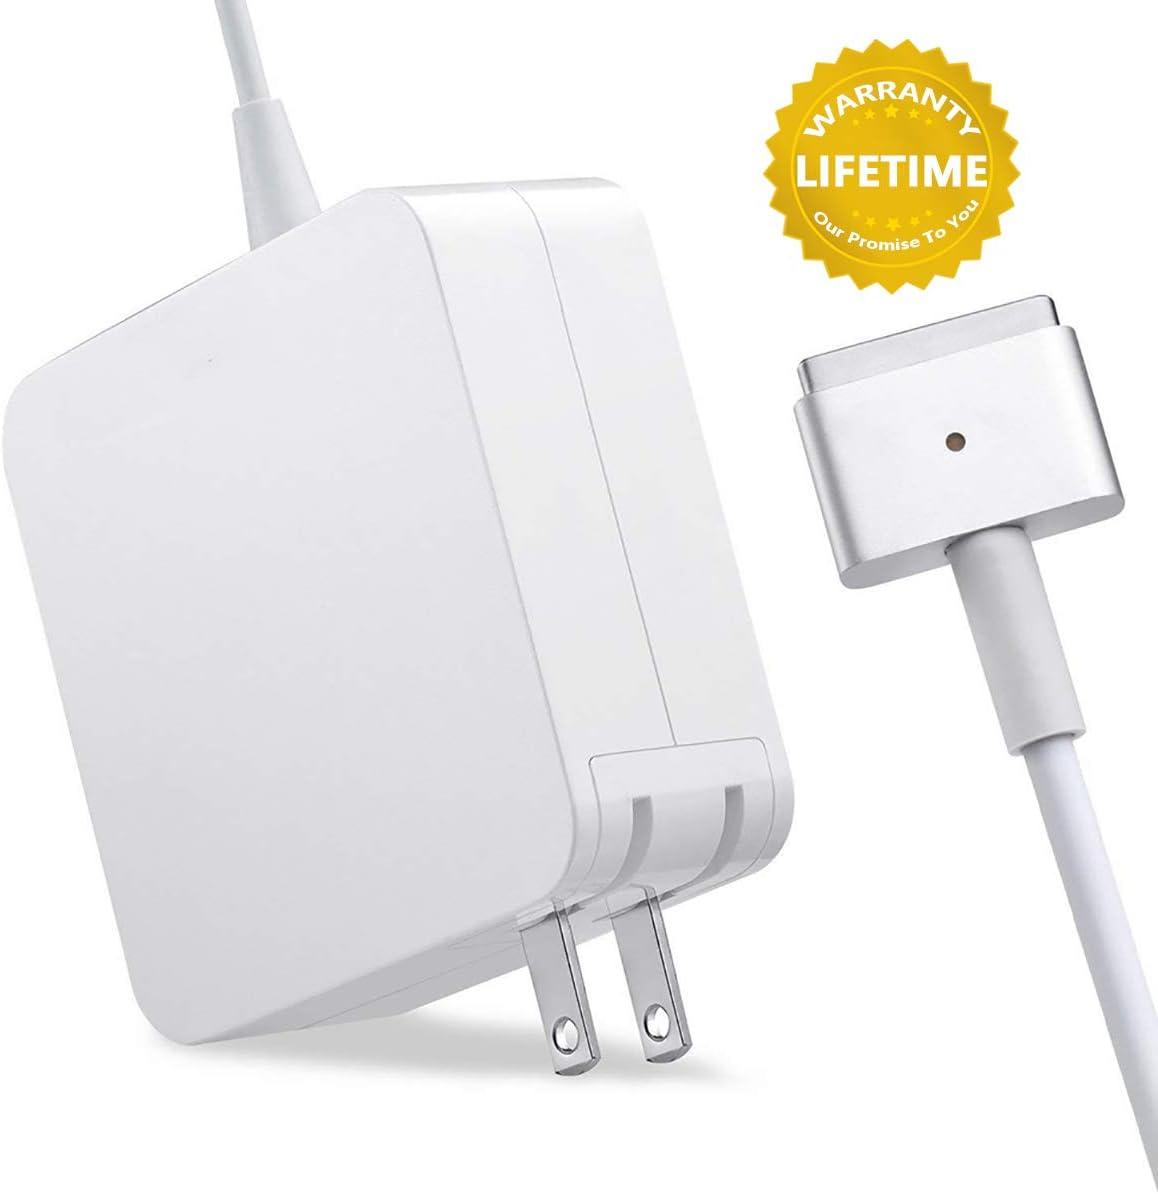 Mac Book Air Charger, Ac 45w 2 (T-Tip) Connector Power Adapter Charger for Mac Book Air 11-inch and 13 inch